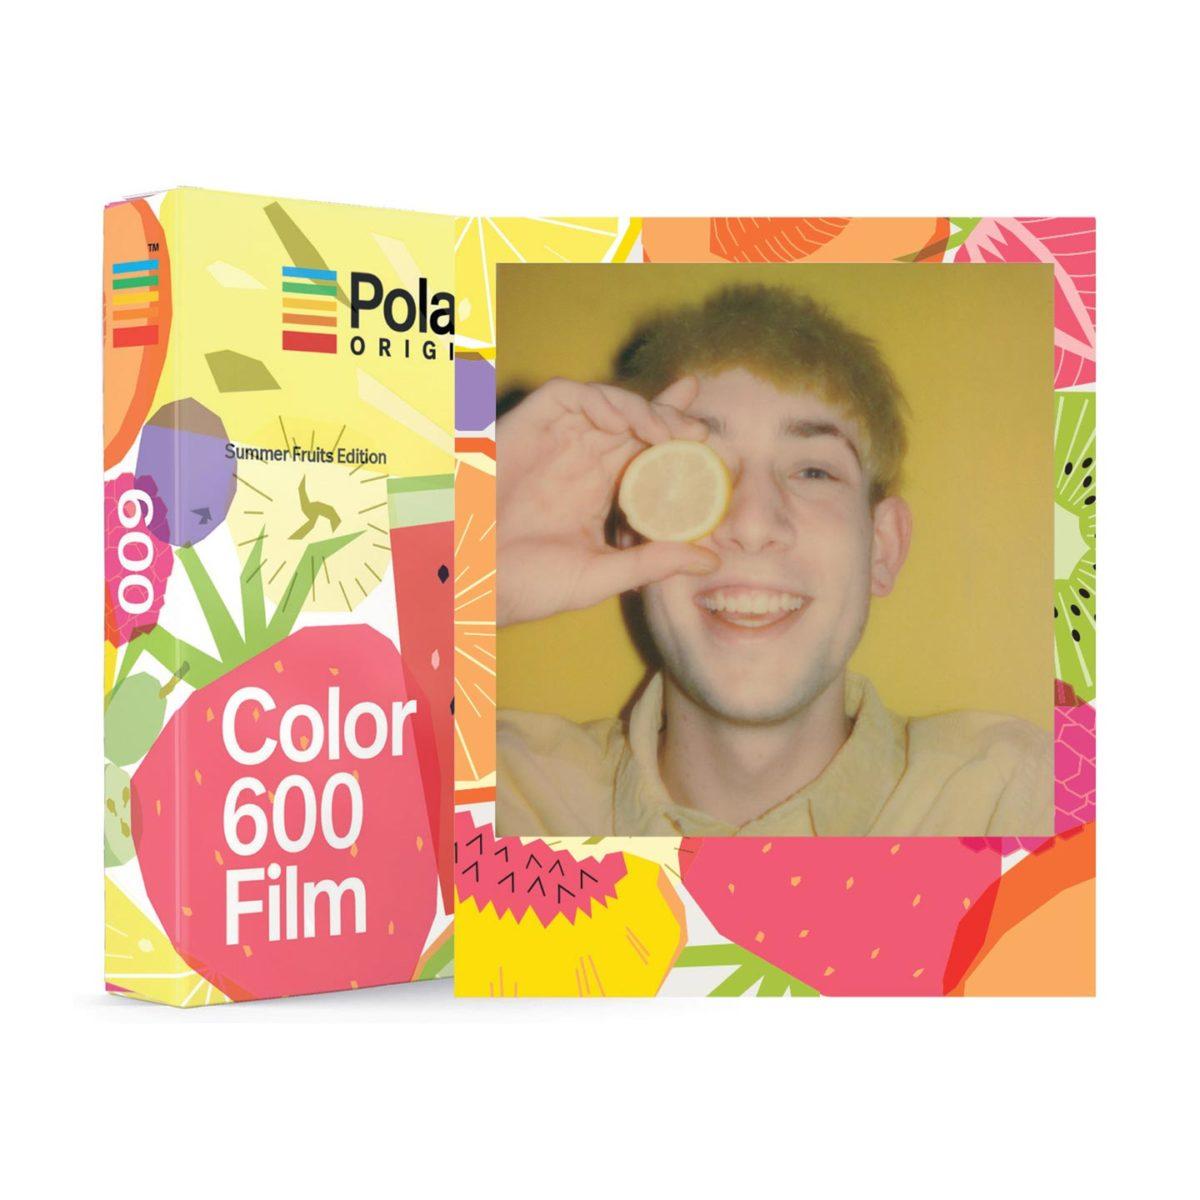 polaroid_600_color_film_summer_fruits_01